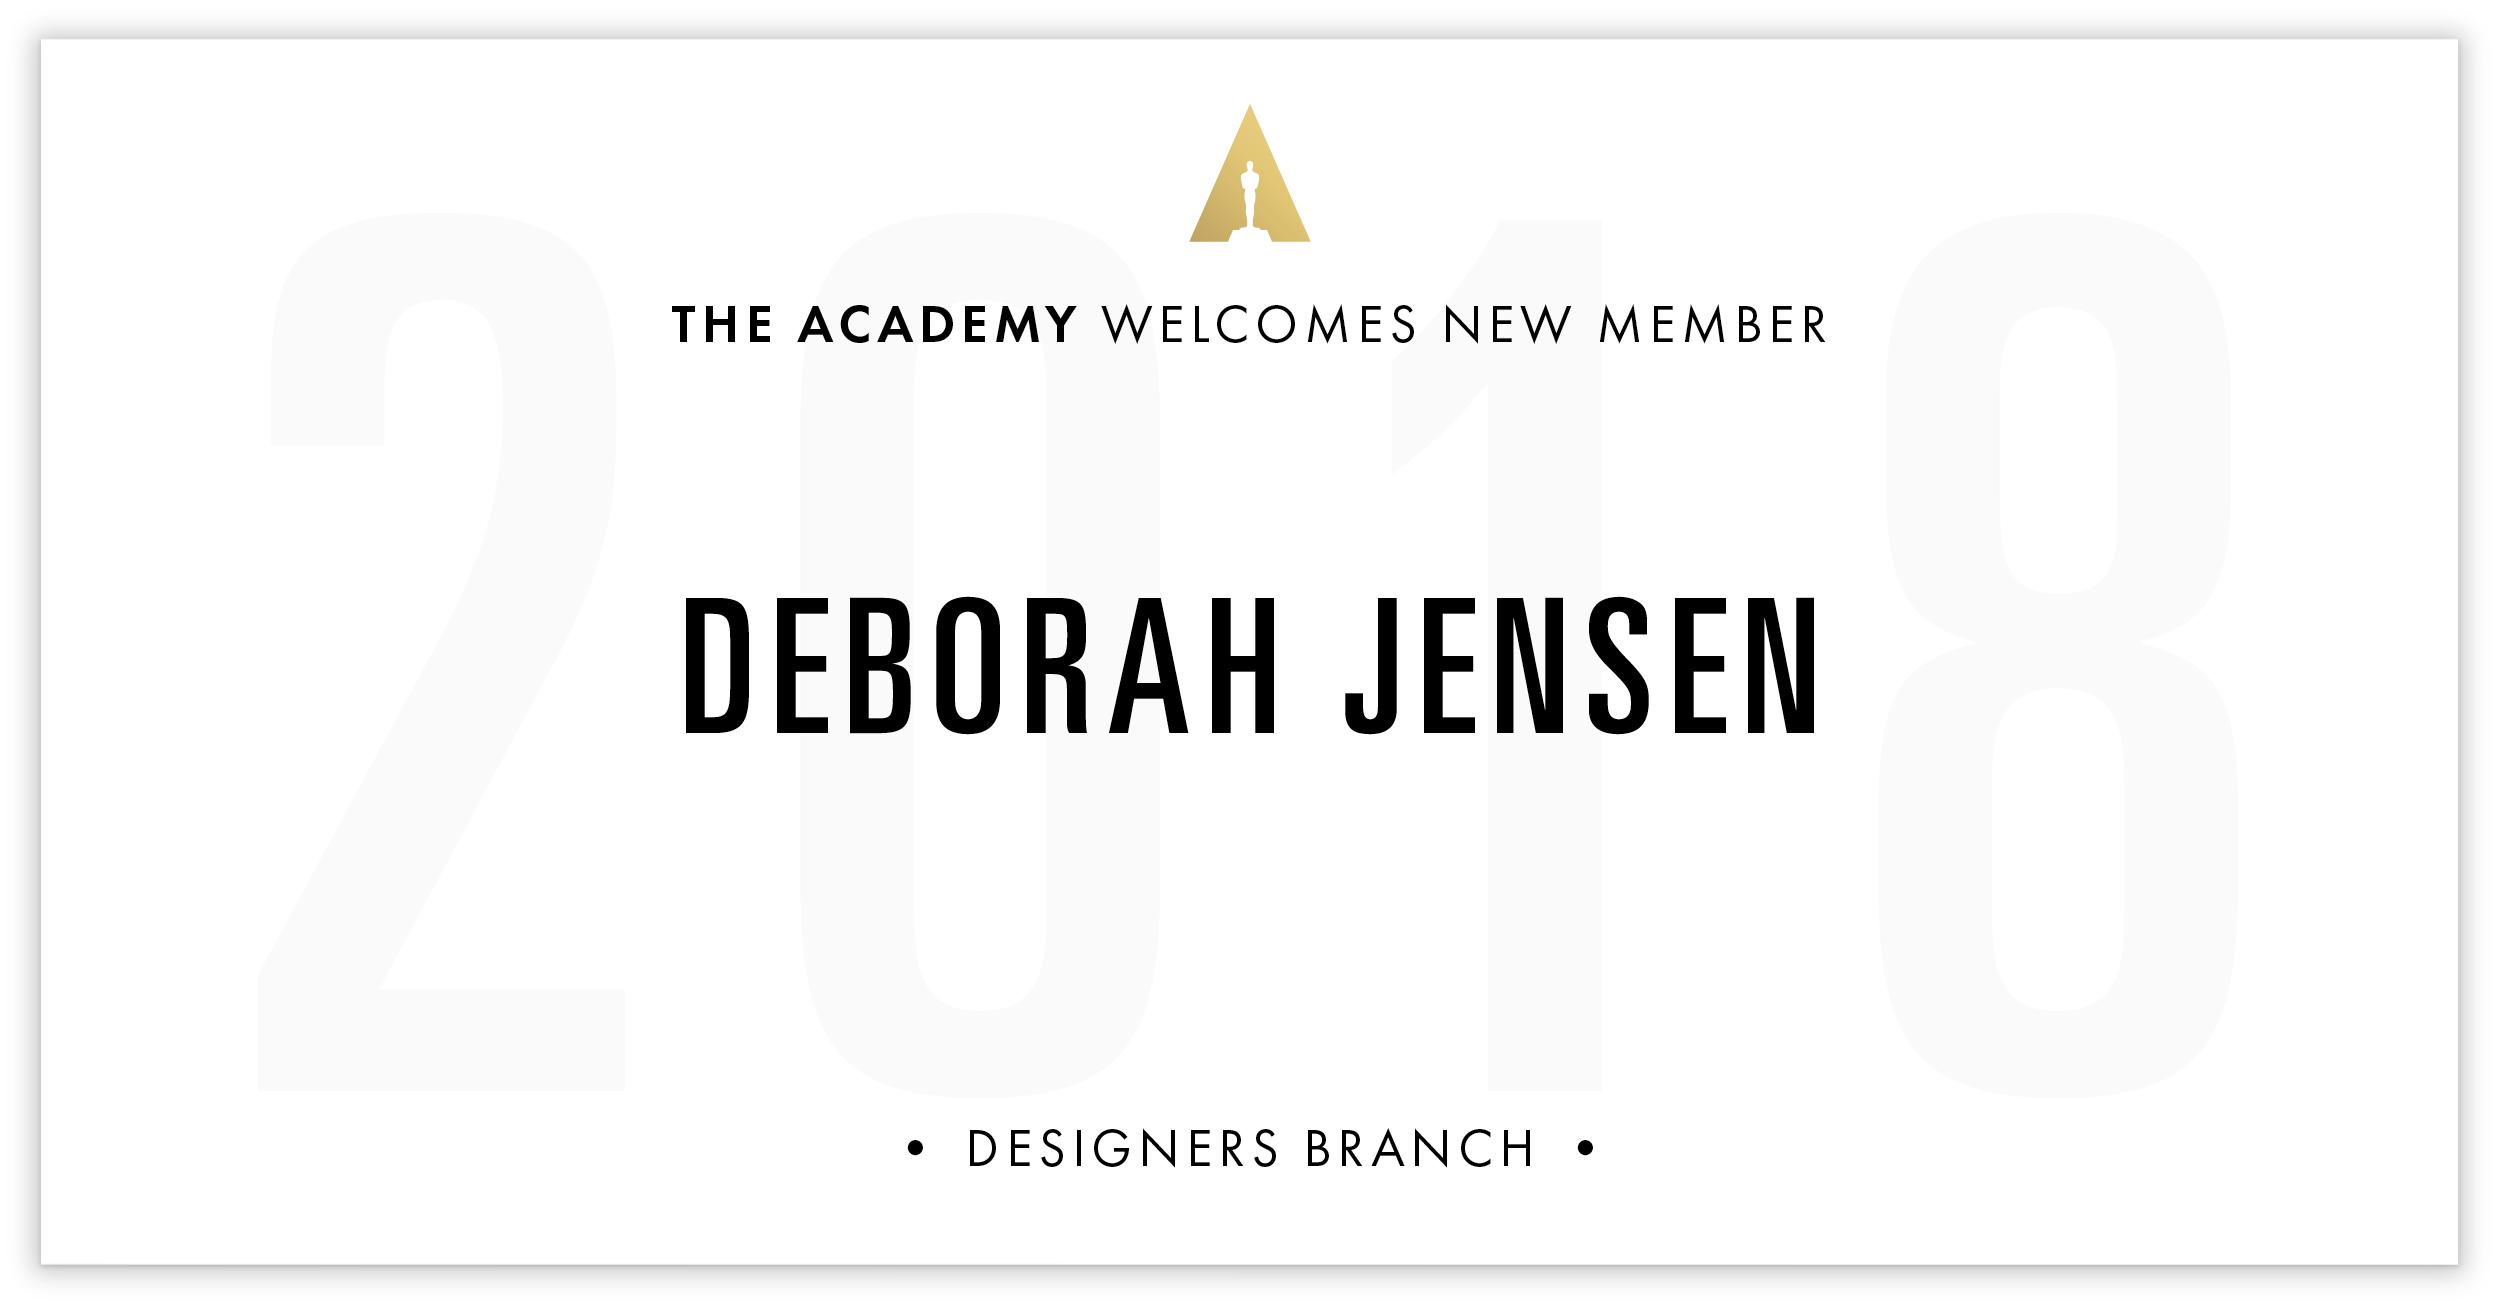 Deborah Jensen is invited!